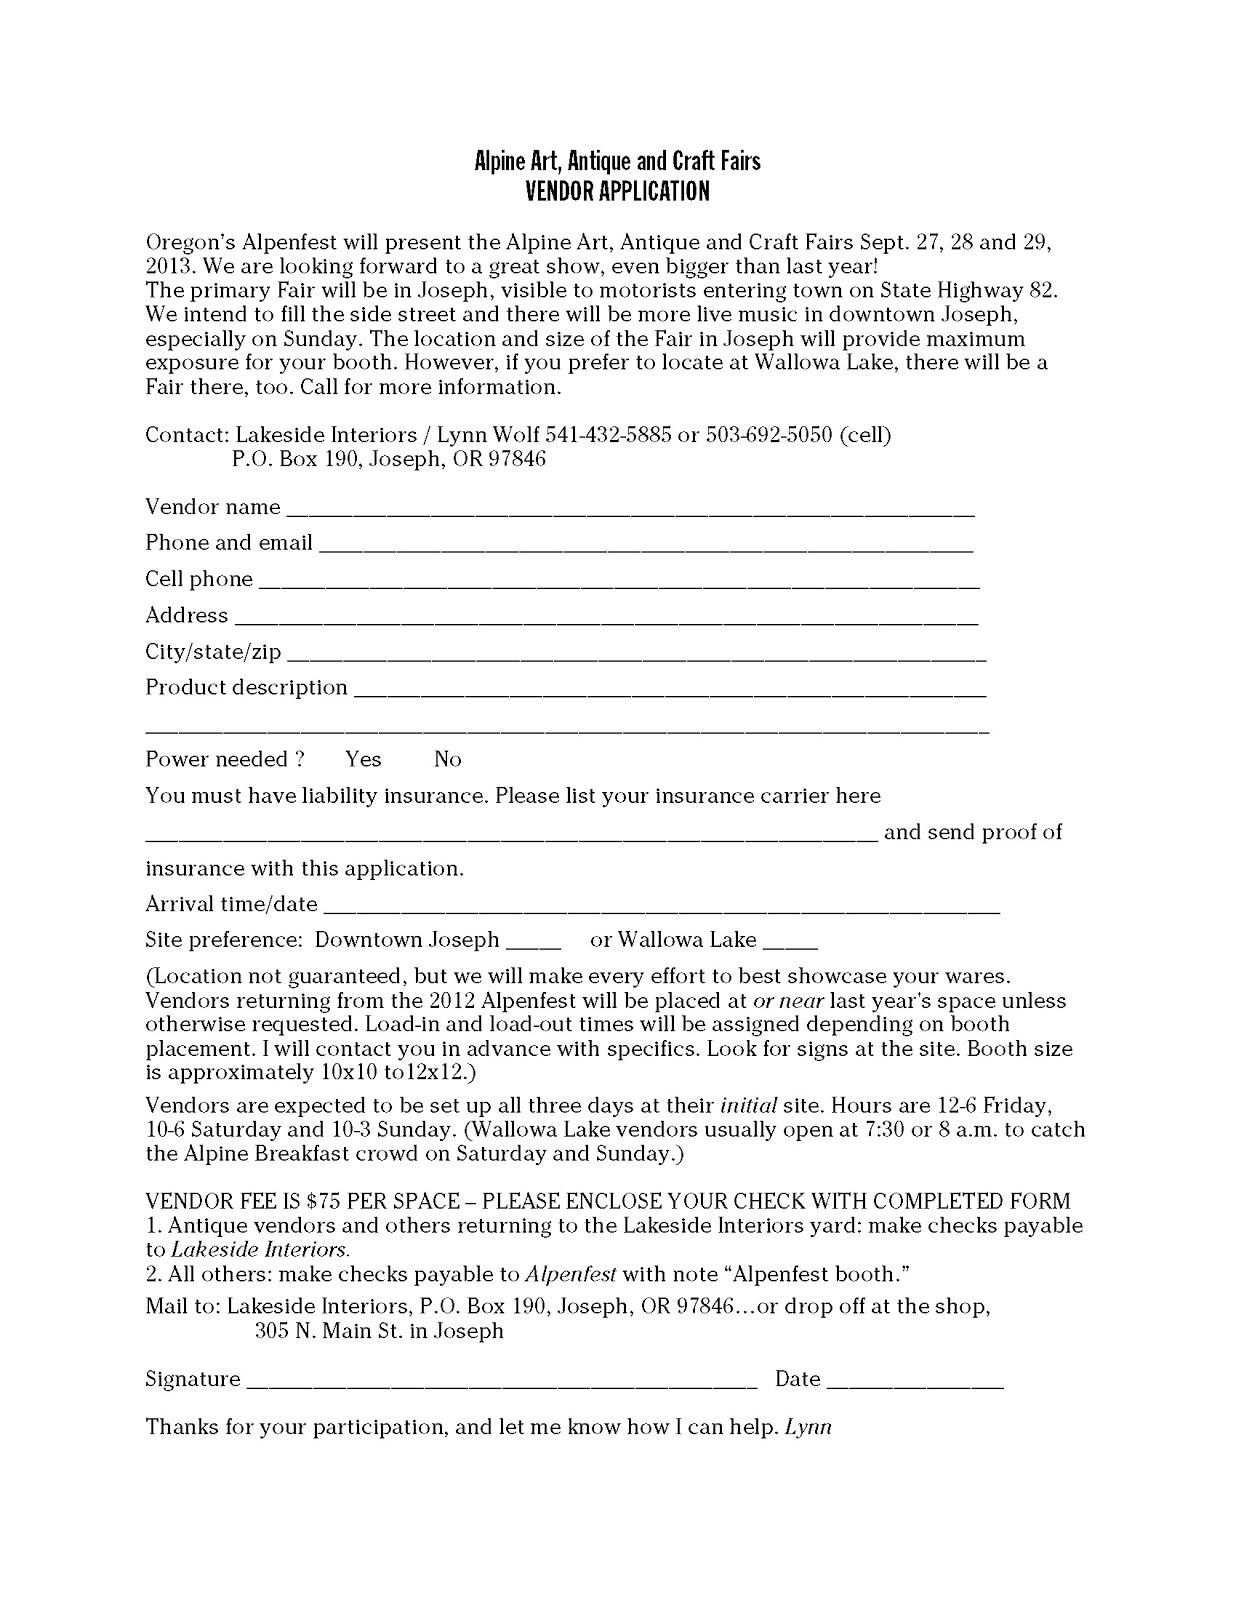 Vendor Form Template sample supplier evaluation 7 documents in – Vendor Form Template